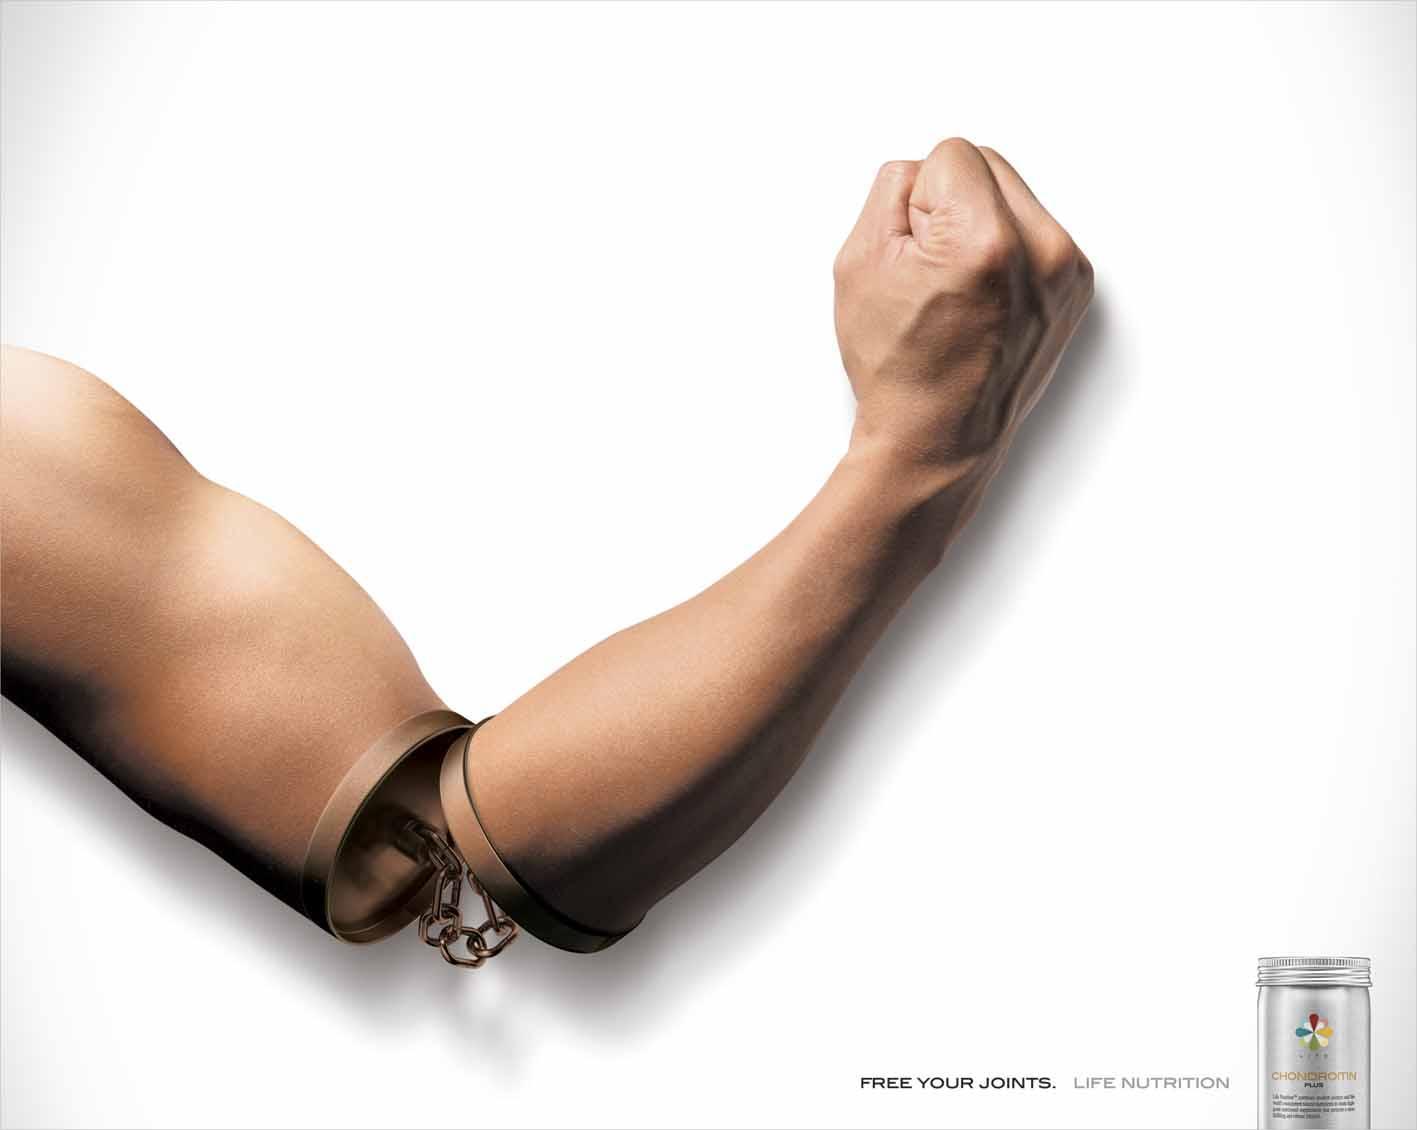 Life Nutrition Print Ad -  Joint Nunchaku, Arm